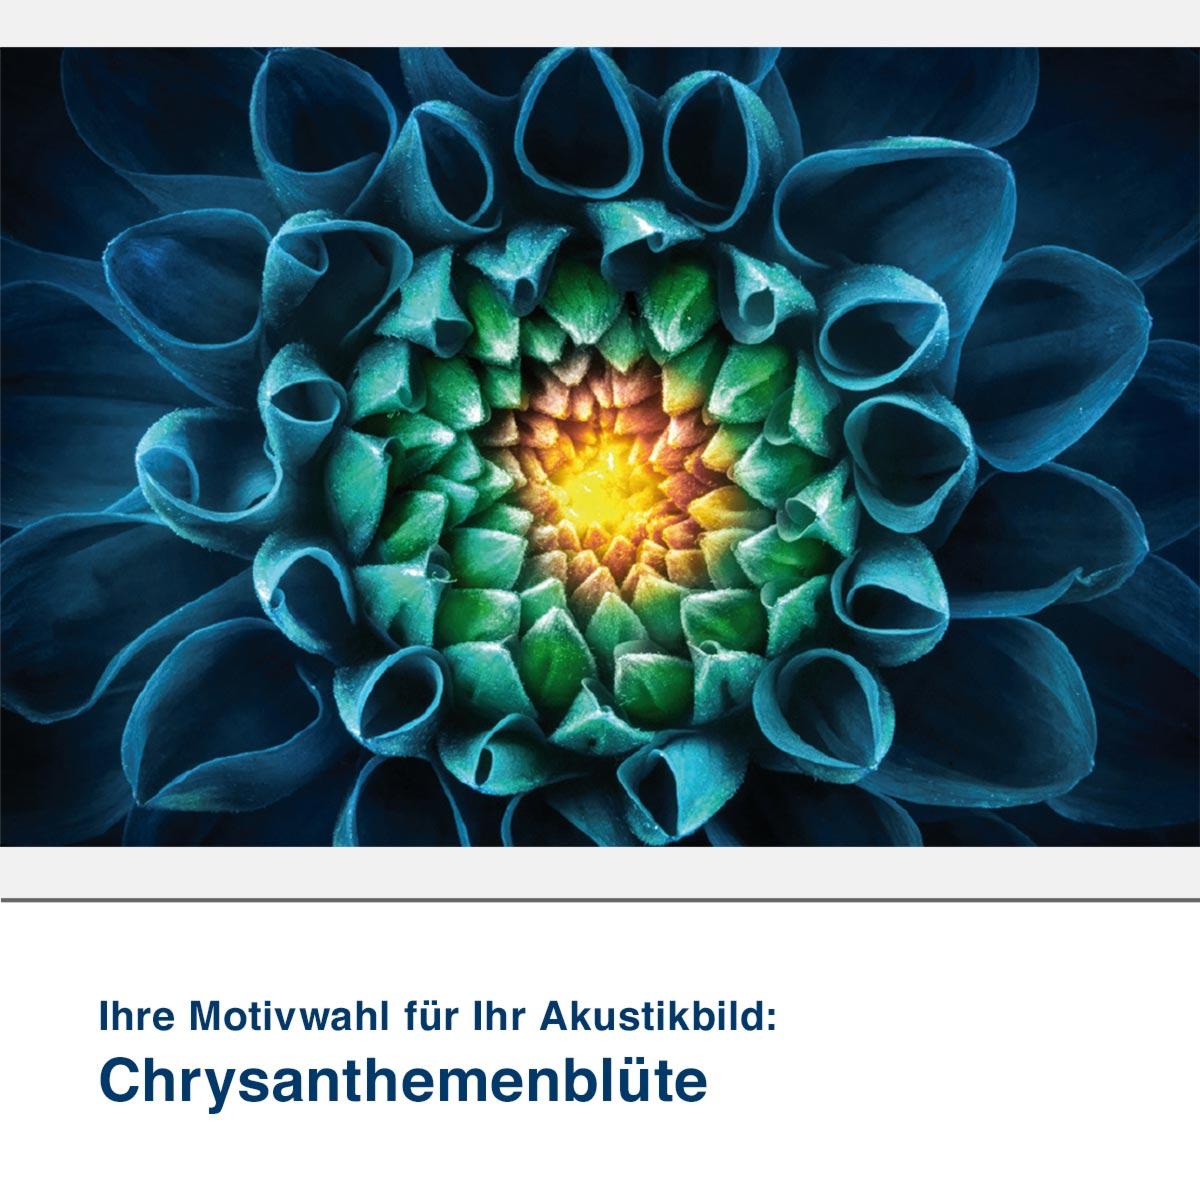 Akustikbild Motiv Chrysanthemenblüte